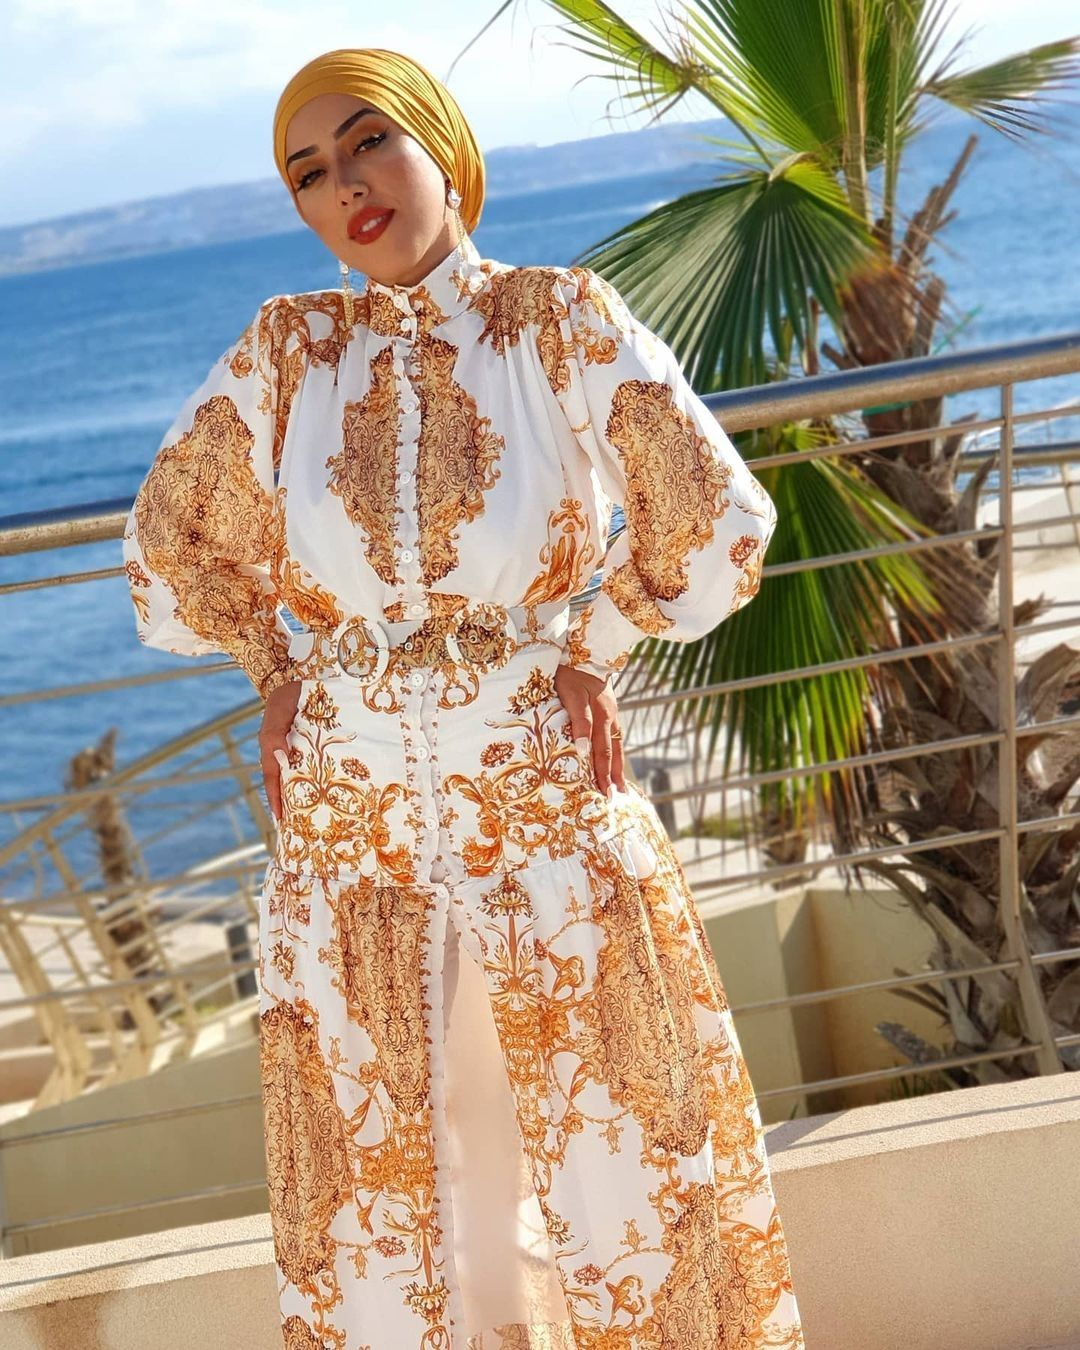 Dz Algerie Algerian Tourismalgeria Dahk Cheddatlemcenia Bejaia Jijel Batna Dzpower Mt Dz الحلويات الجزائرية المطب In 2021 Fashion Dresses Cover Up